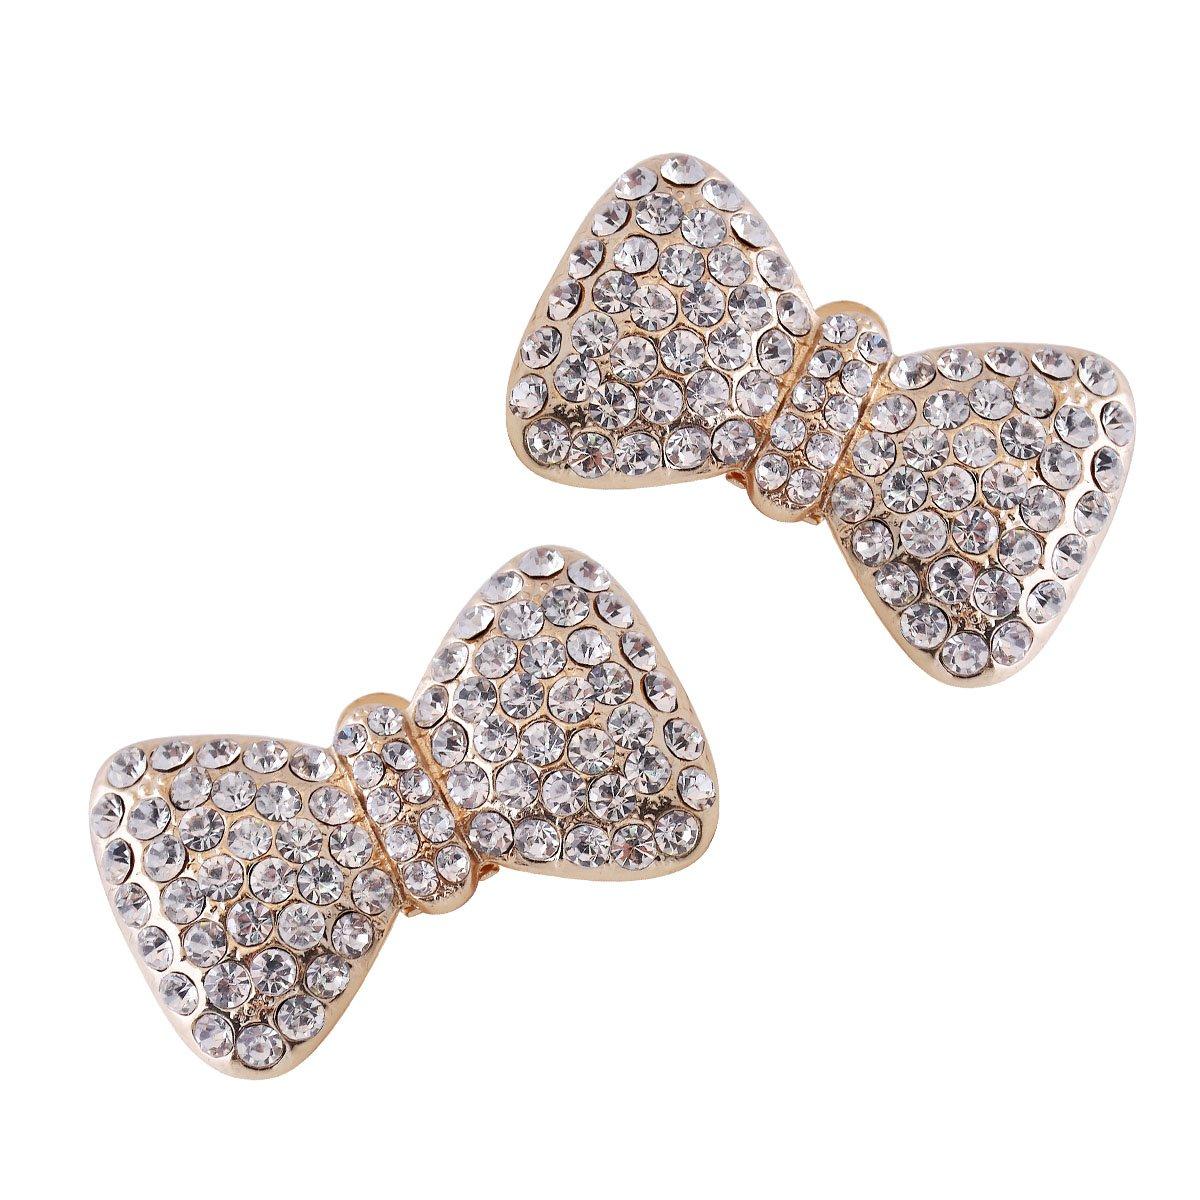 ElegantPark CF Crystal Shoe Clips Bows Design Wedding Party Decoration Gold 2 Pcs